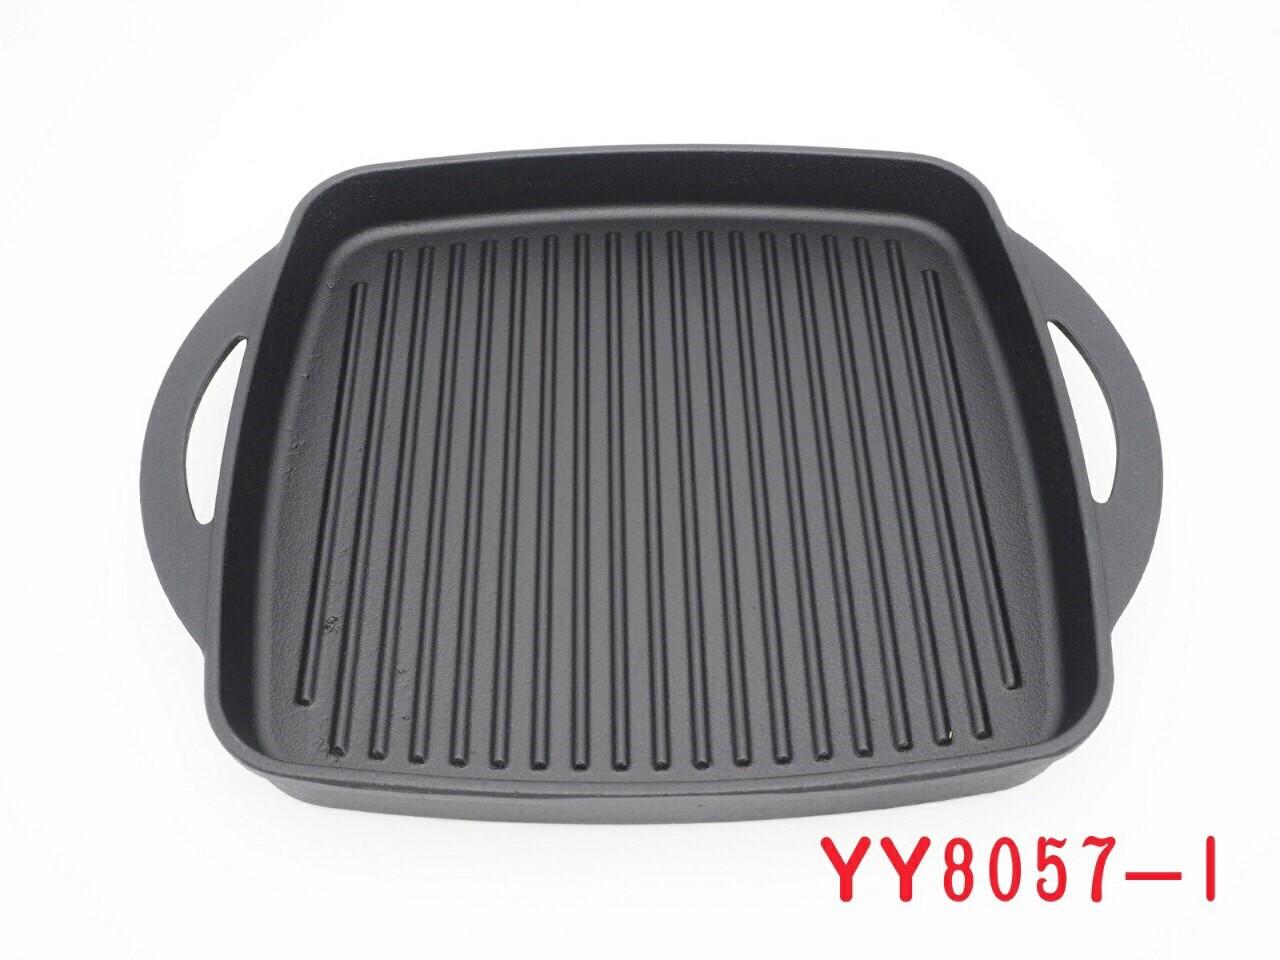 YY8057-1